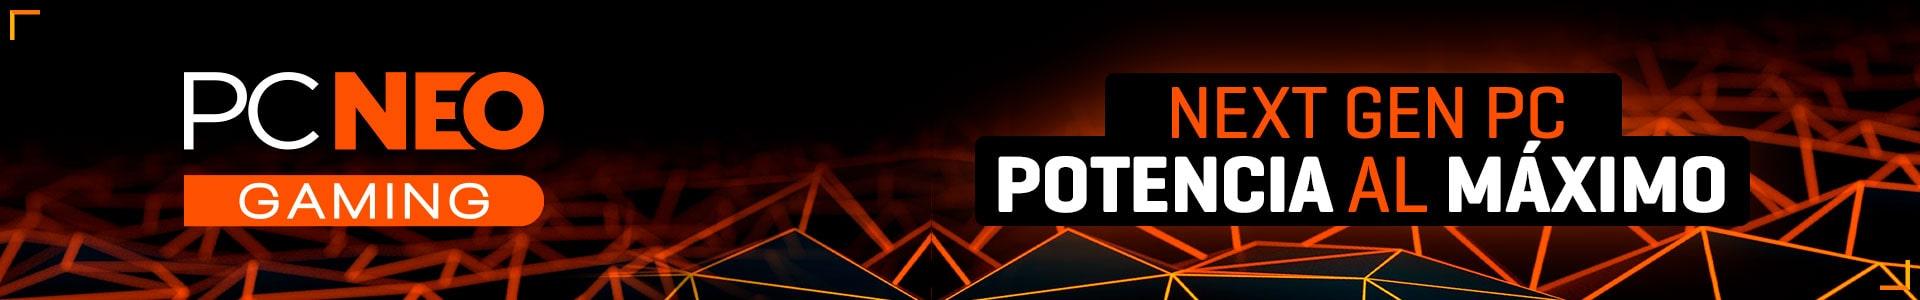 PC Neo Gaming : Potencia al máximo